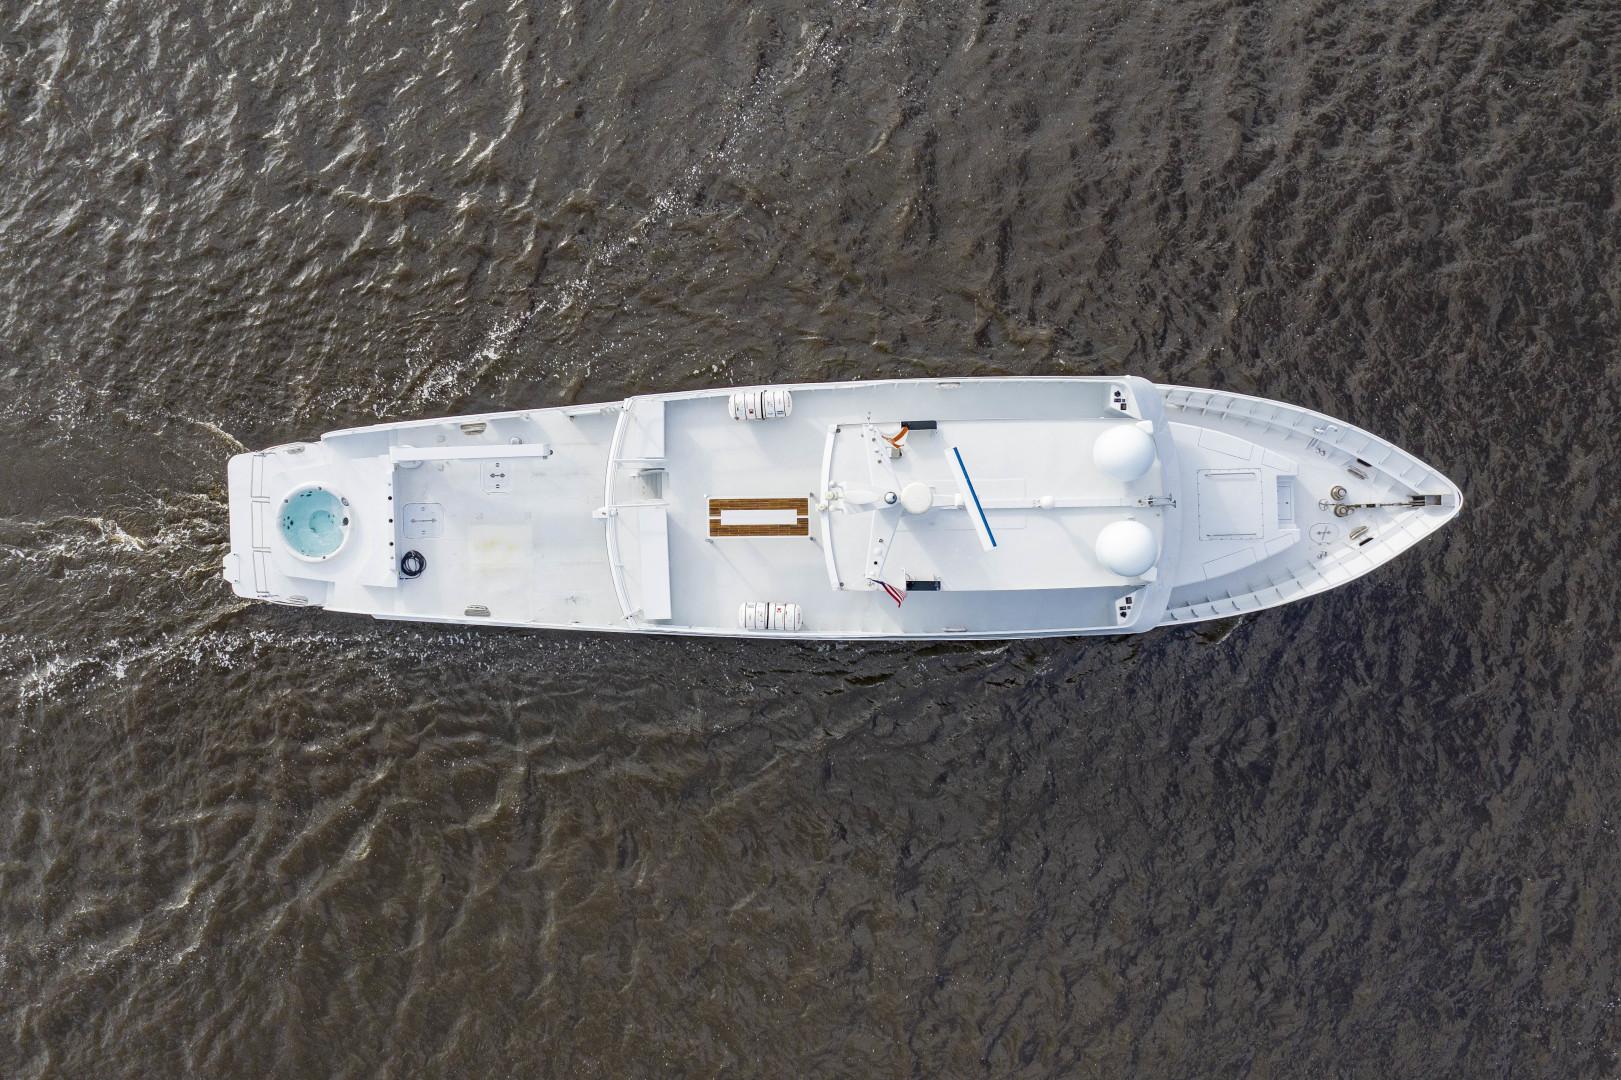 GlassTech-Expedition Yacht 2018-Reset Stuart-Florida-United States-Profile-1568533 | Thumbnail